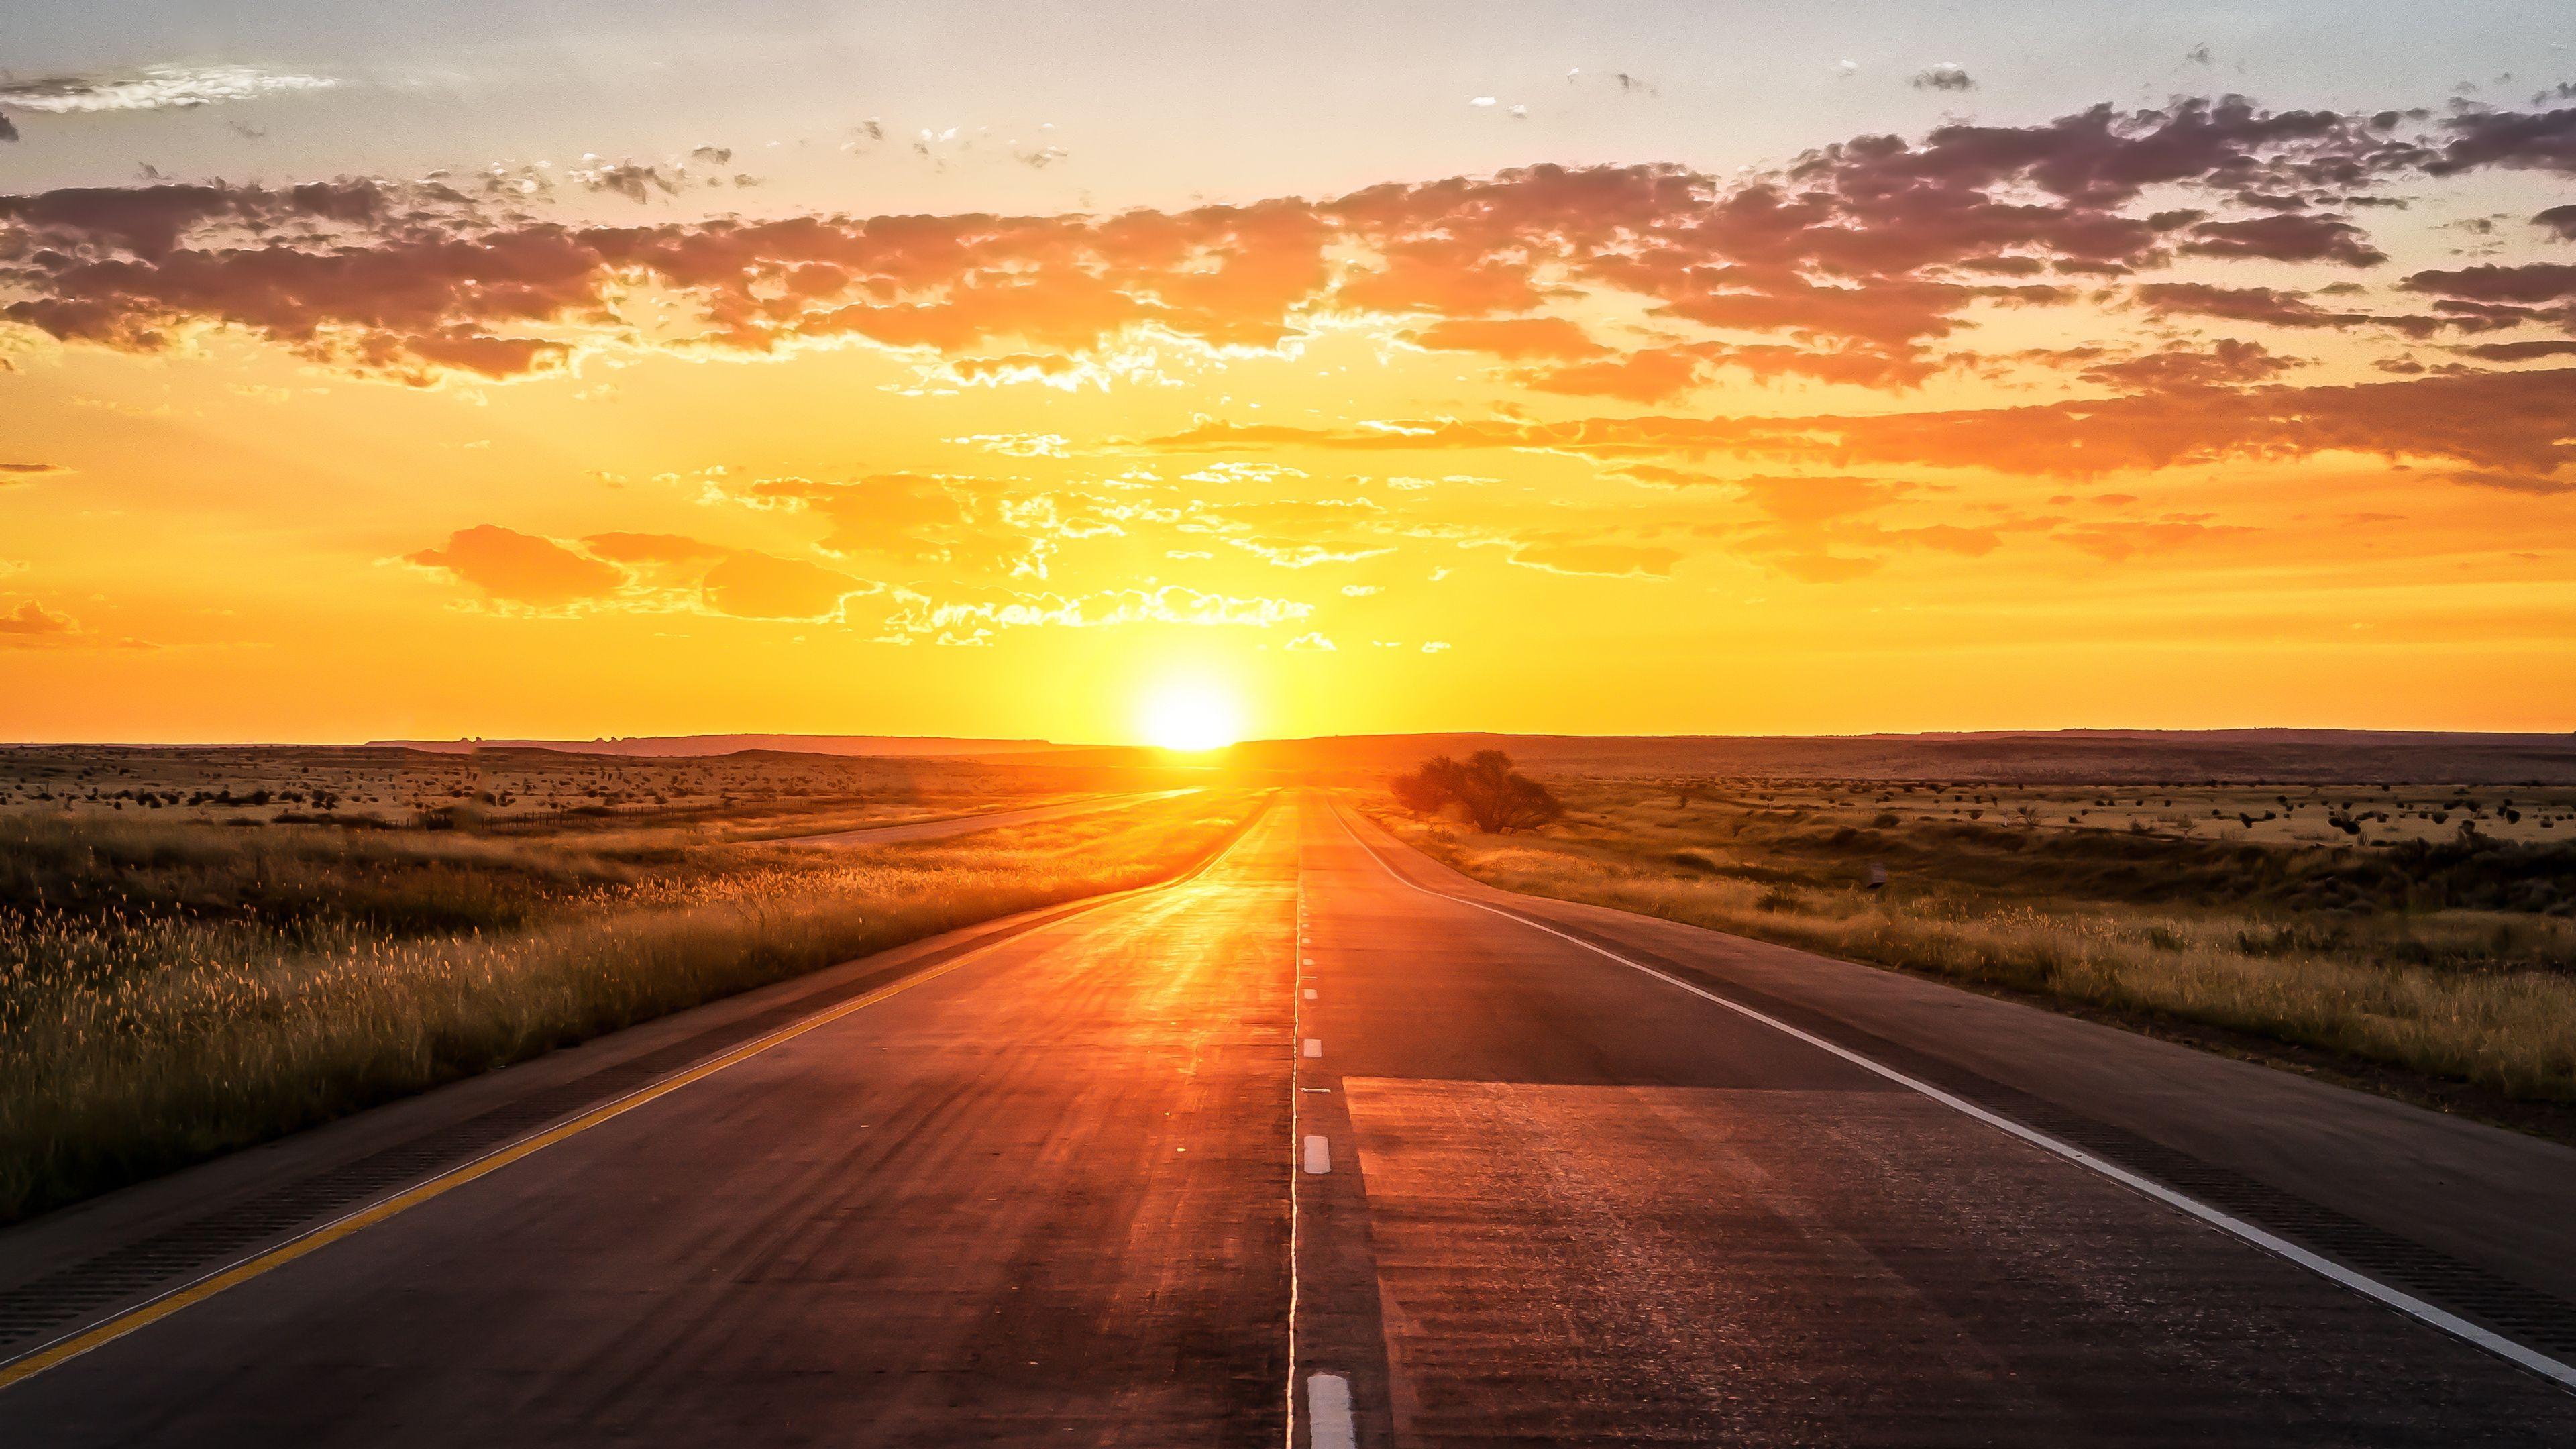 Lab 6 Inspiration Sunset Road Sunset Wallpaper Sunset Hd wallpaper sunset horizon road winter